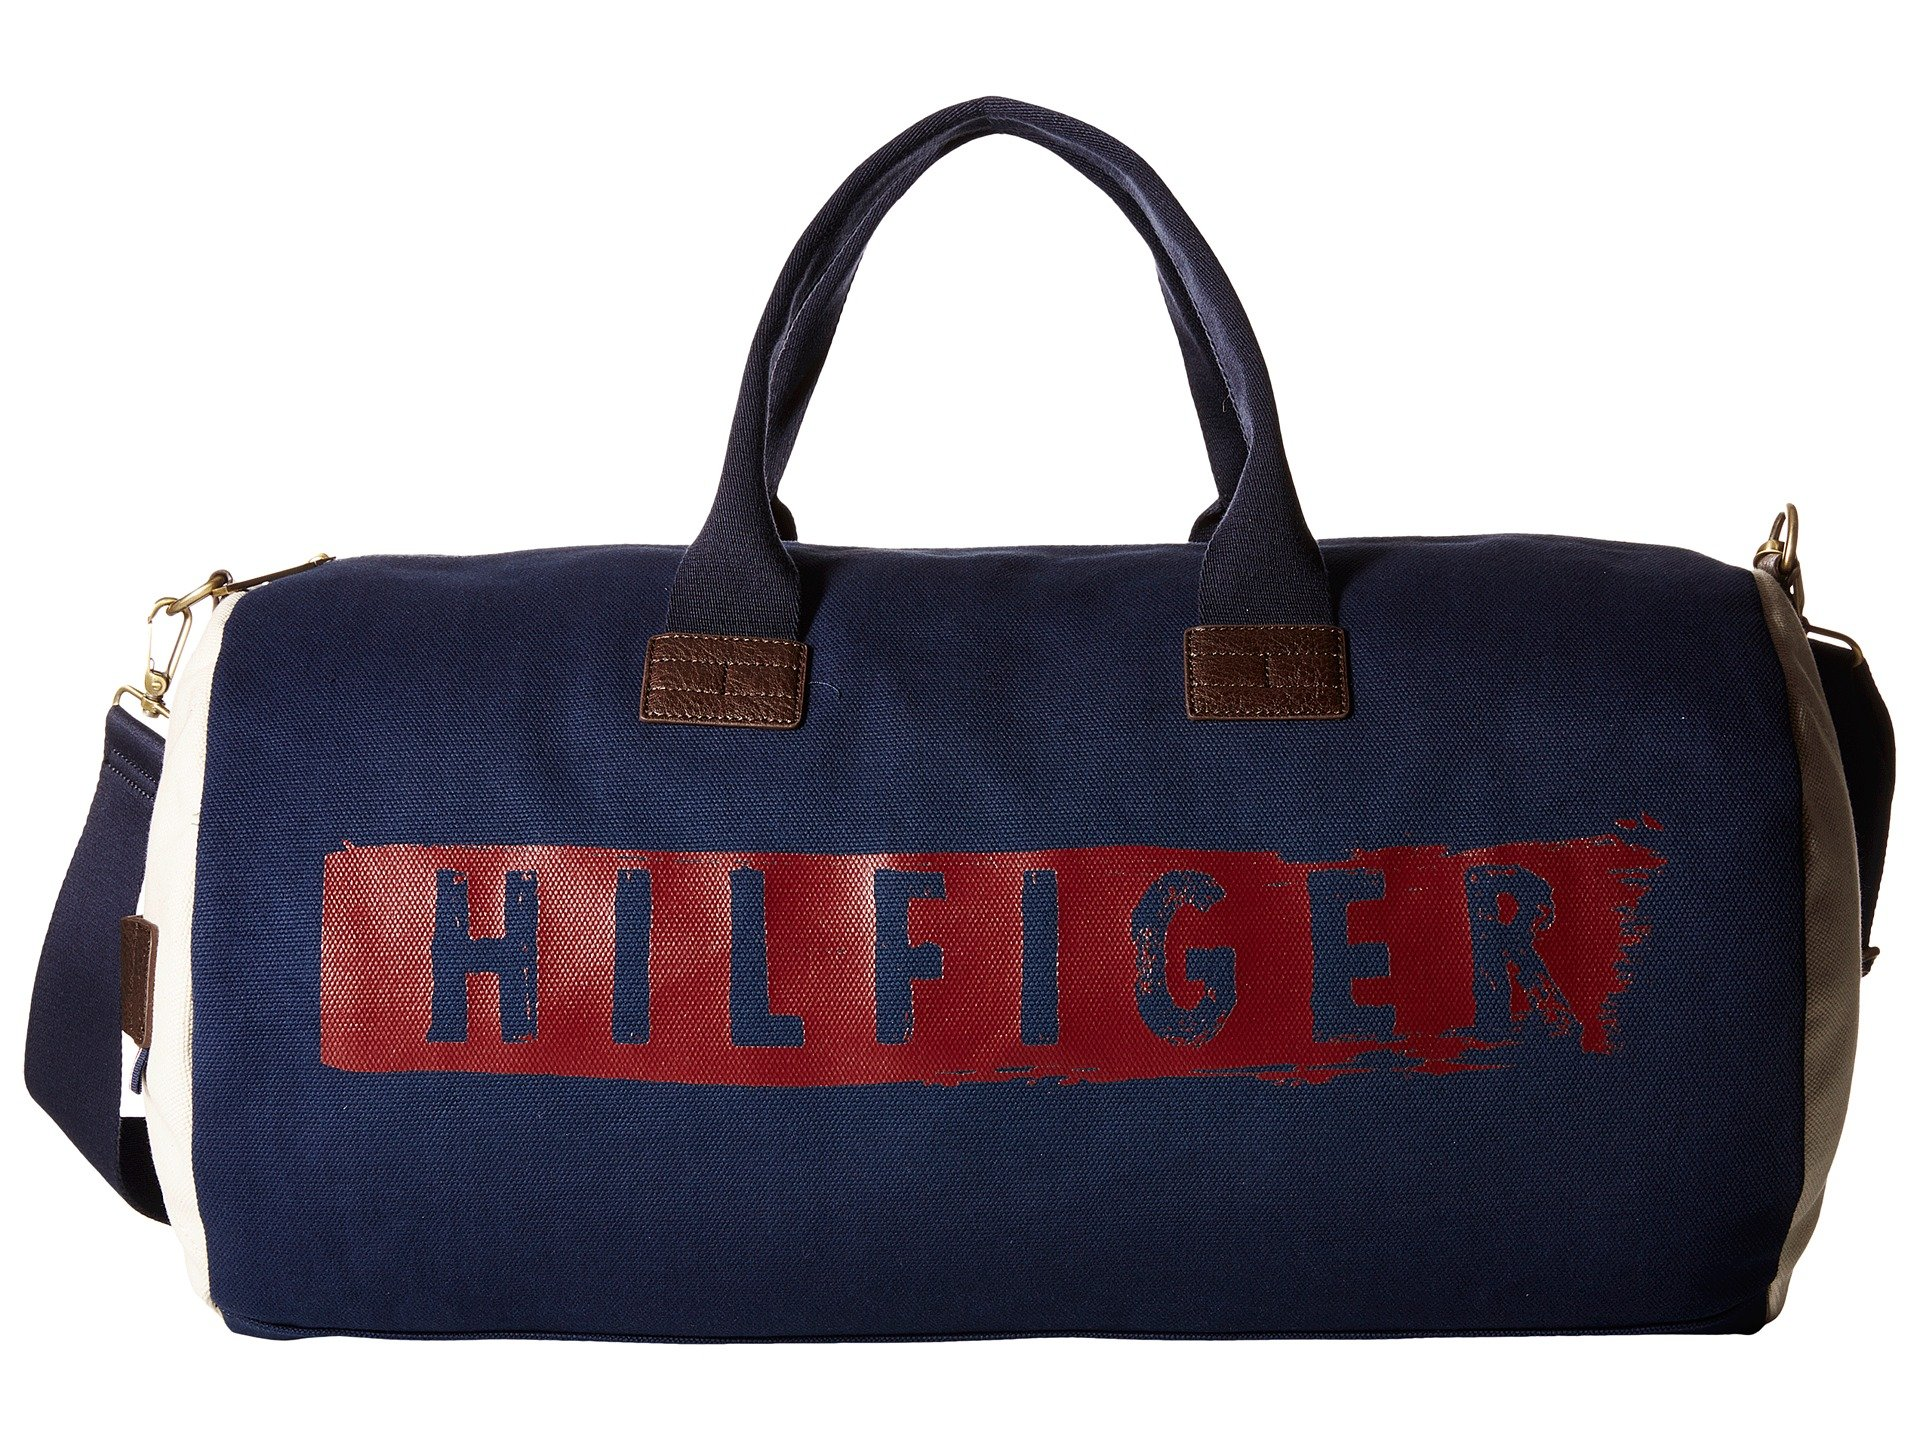 Bolso de Lona para Hombre Tommy Hilfiger Hilfiger Duffles-Weekender-Washed Canvas w/ PU Trim  + Tommy Hilfiger en VeoyCompro.net